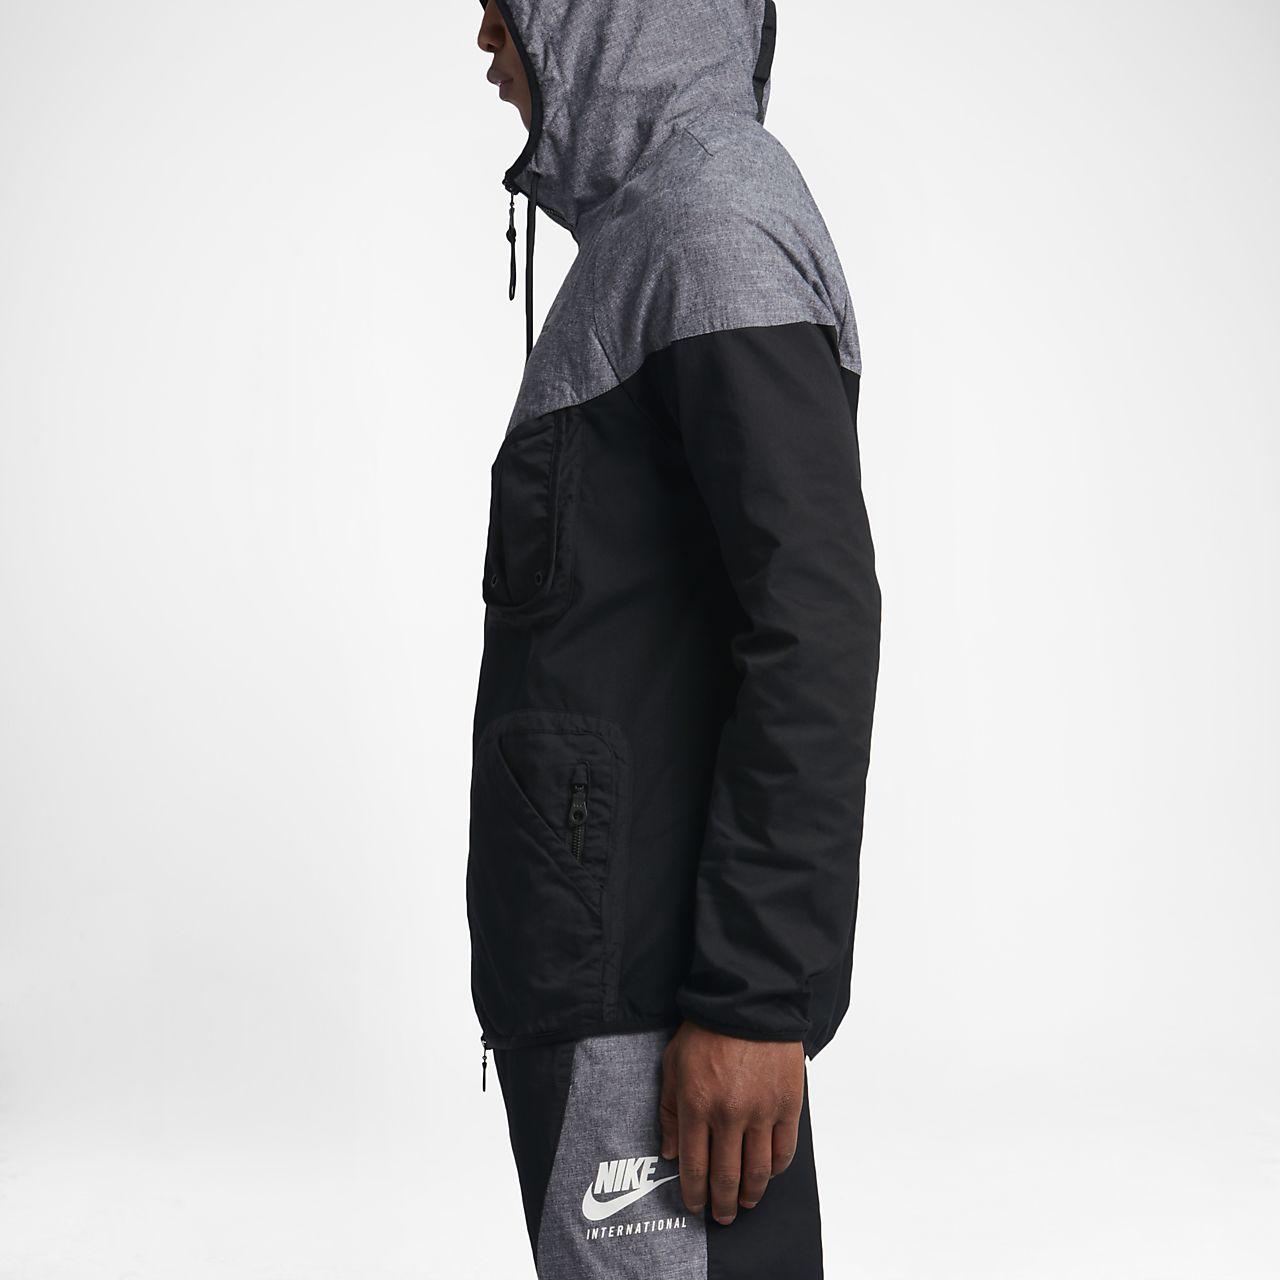 3989dc25f50be1 Low Resolution Nike International Windrunner Men s Jacket Nike  International Windrunner Men s Jacket